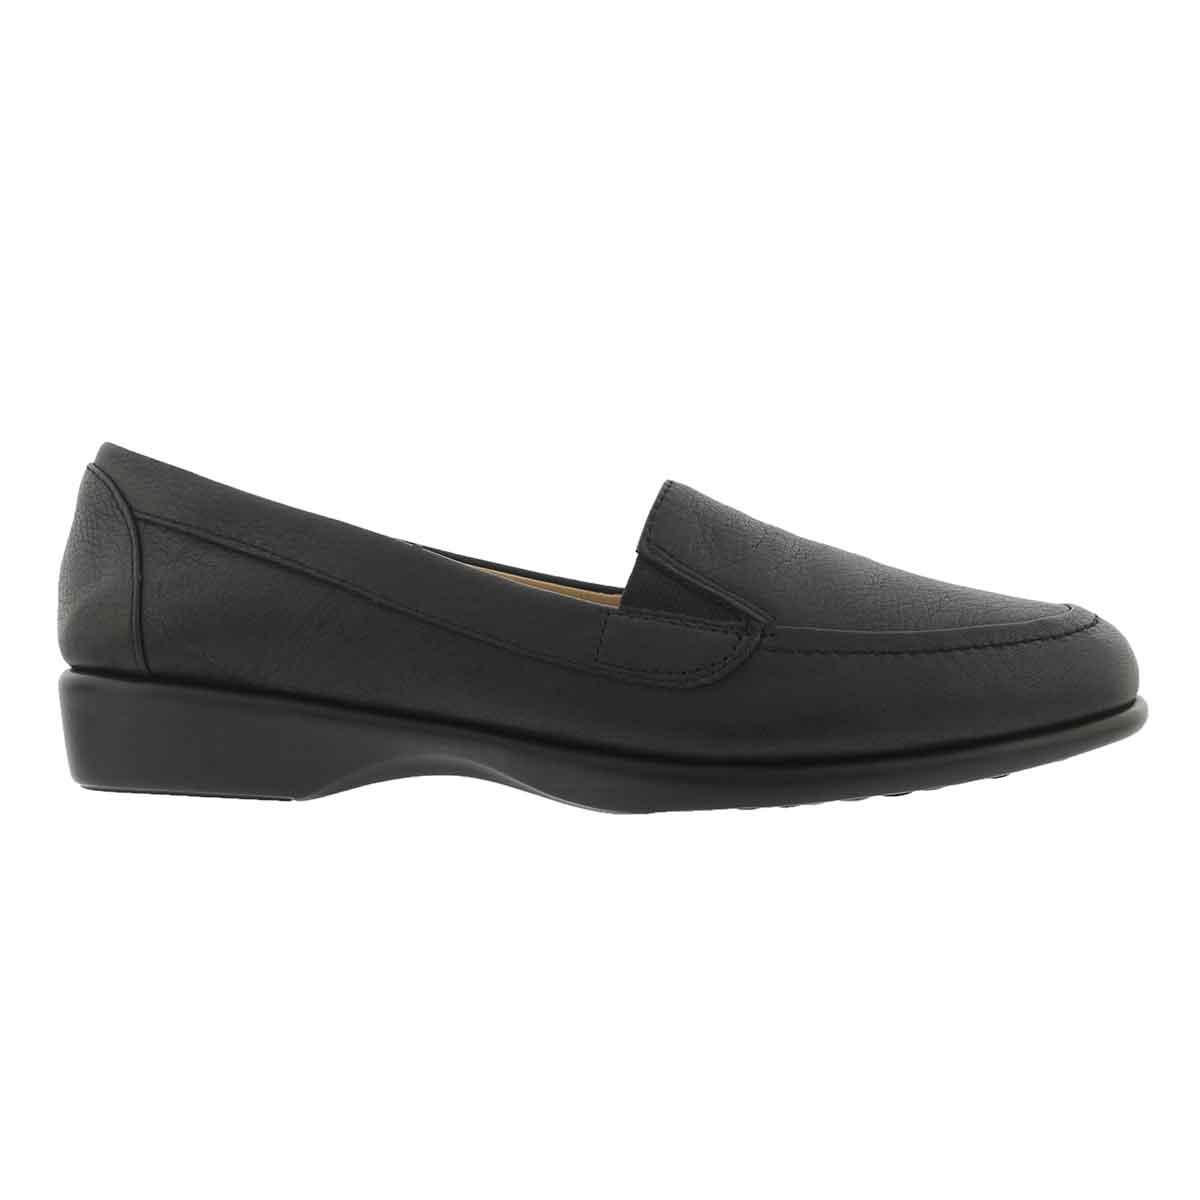 Lds Jennah Paradise black dress loafer